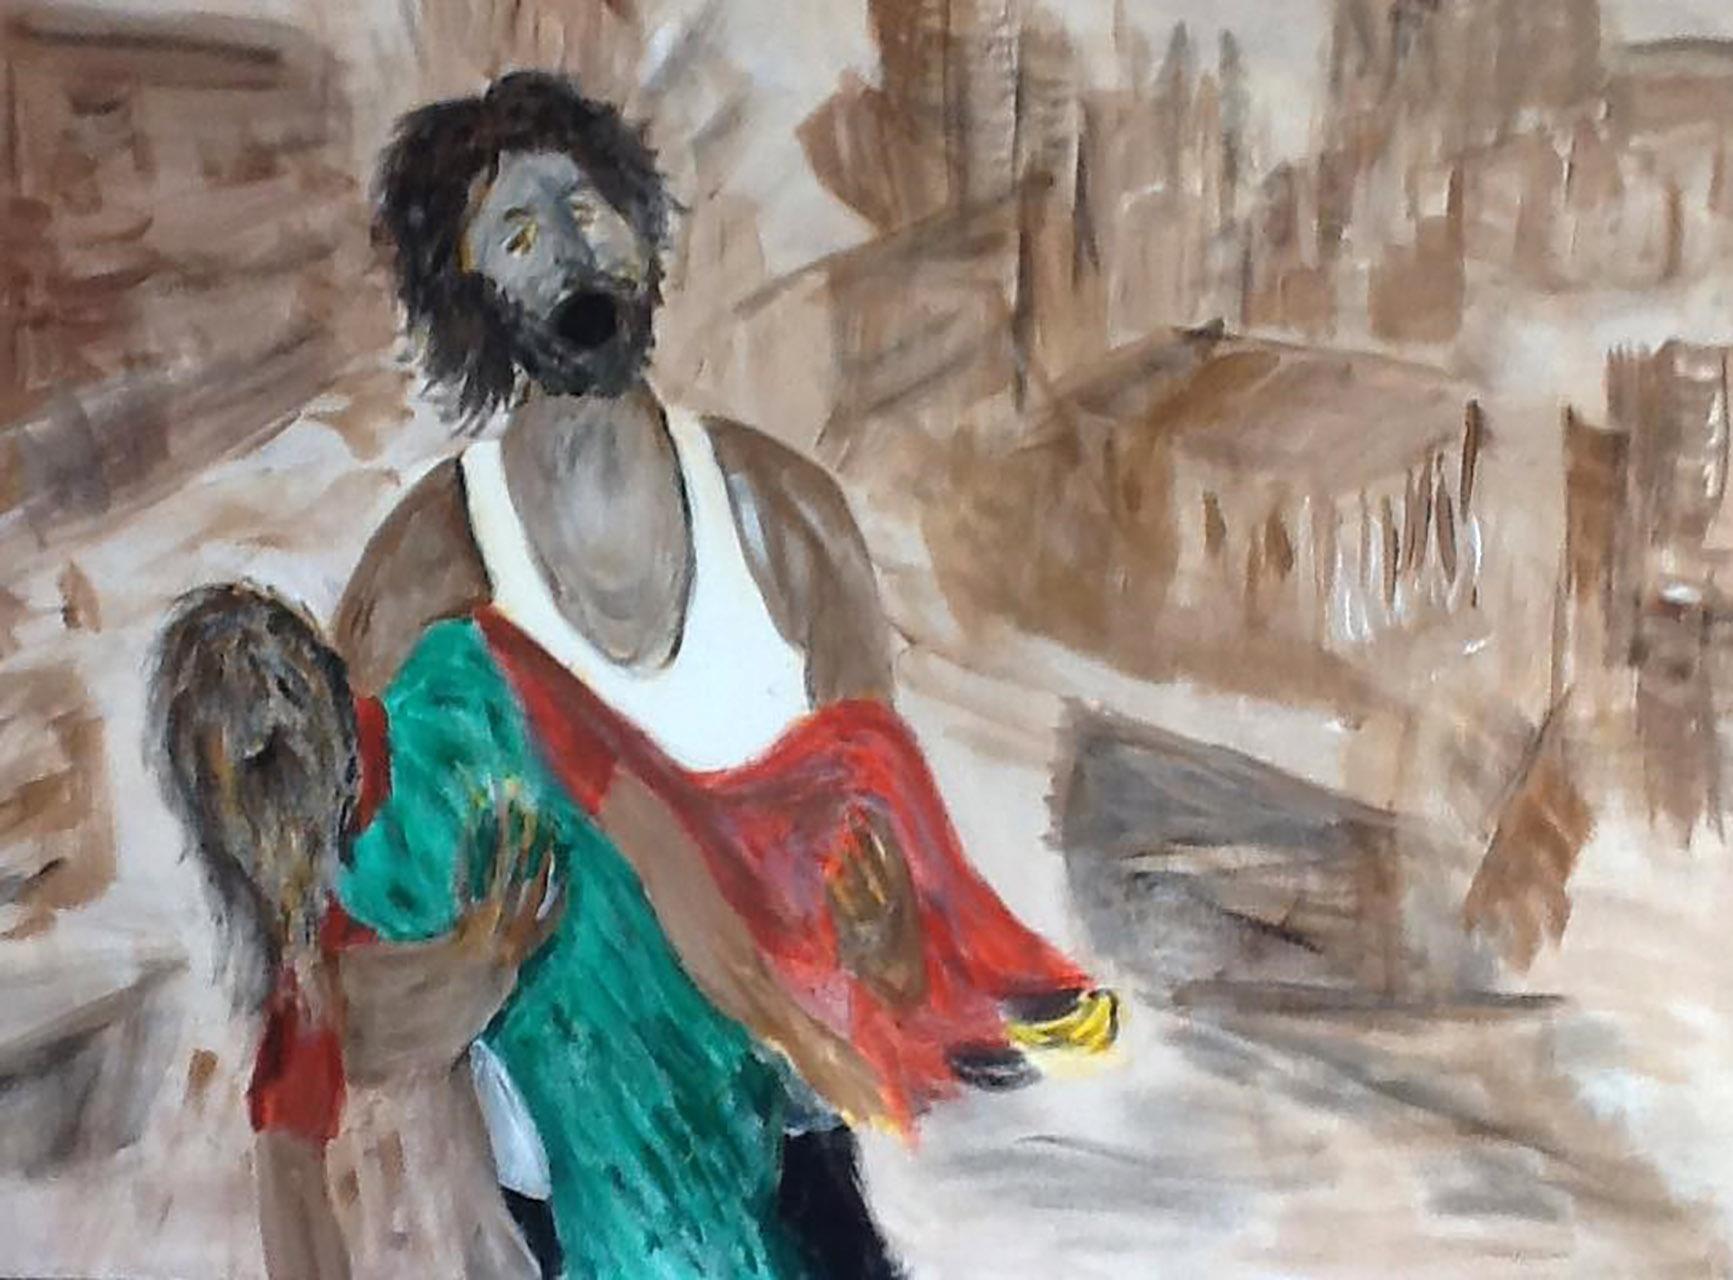 Frans van Bronkhorst_Wanhoop - Syrië_acryl op doek_60x40